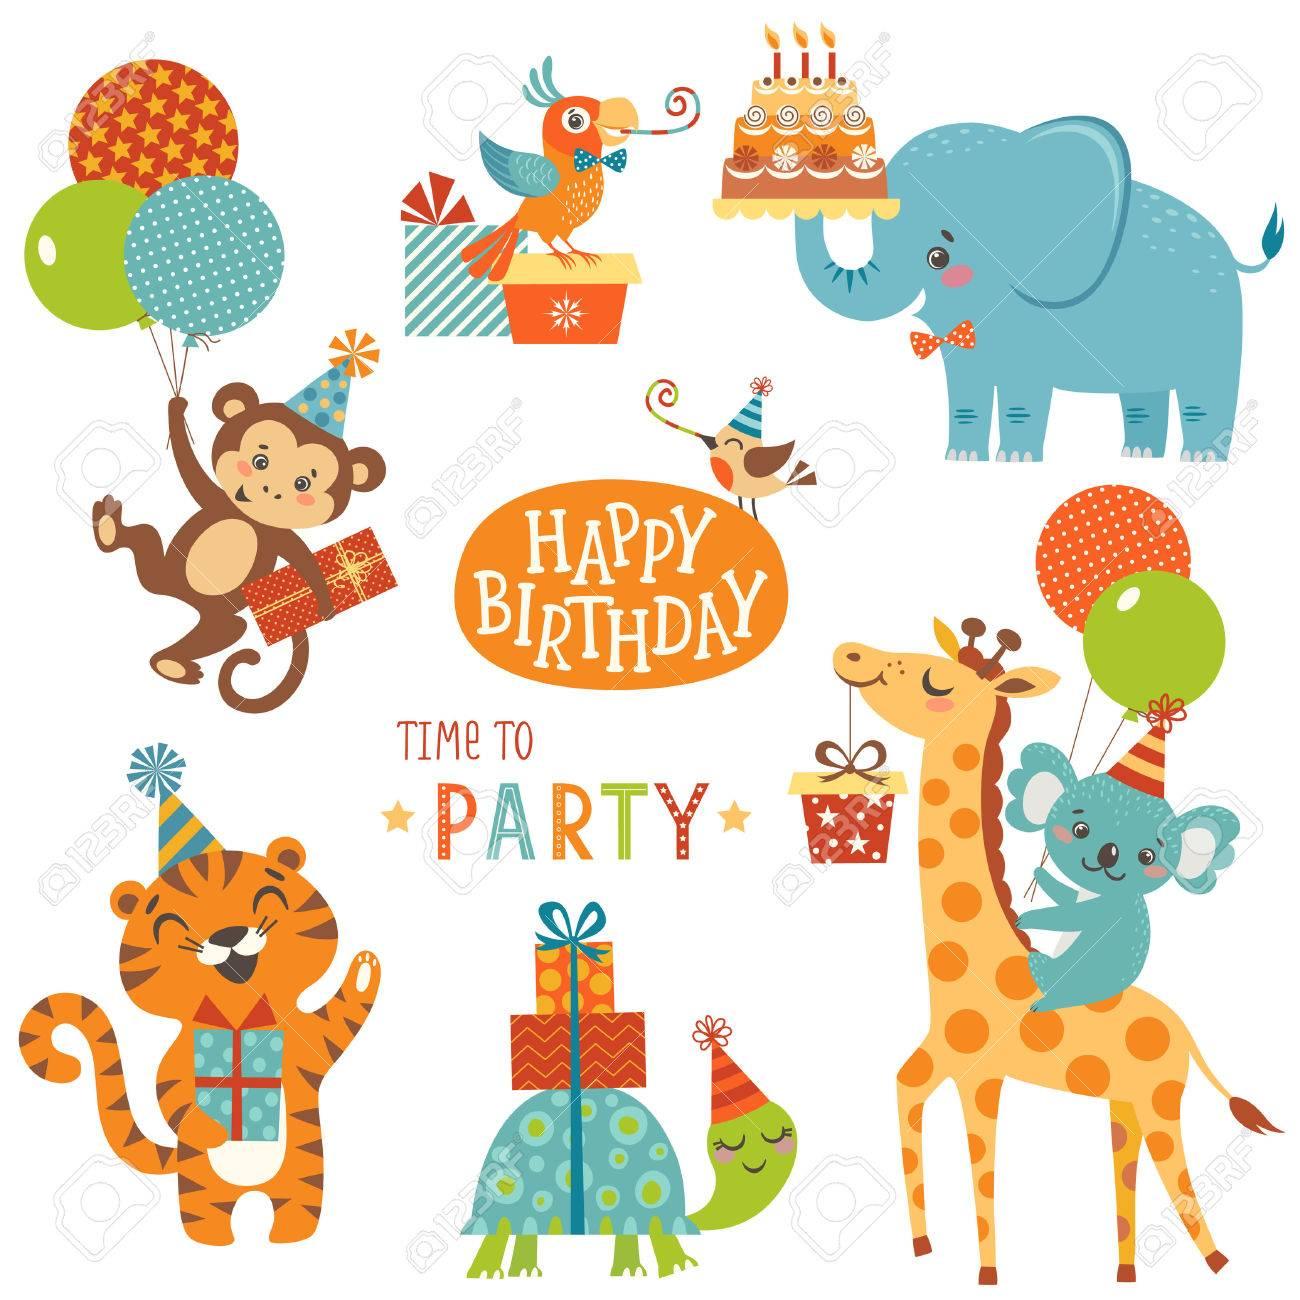 Set of cute animals for happy birthday design.